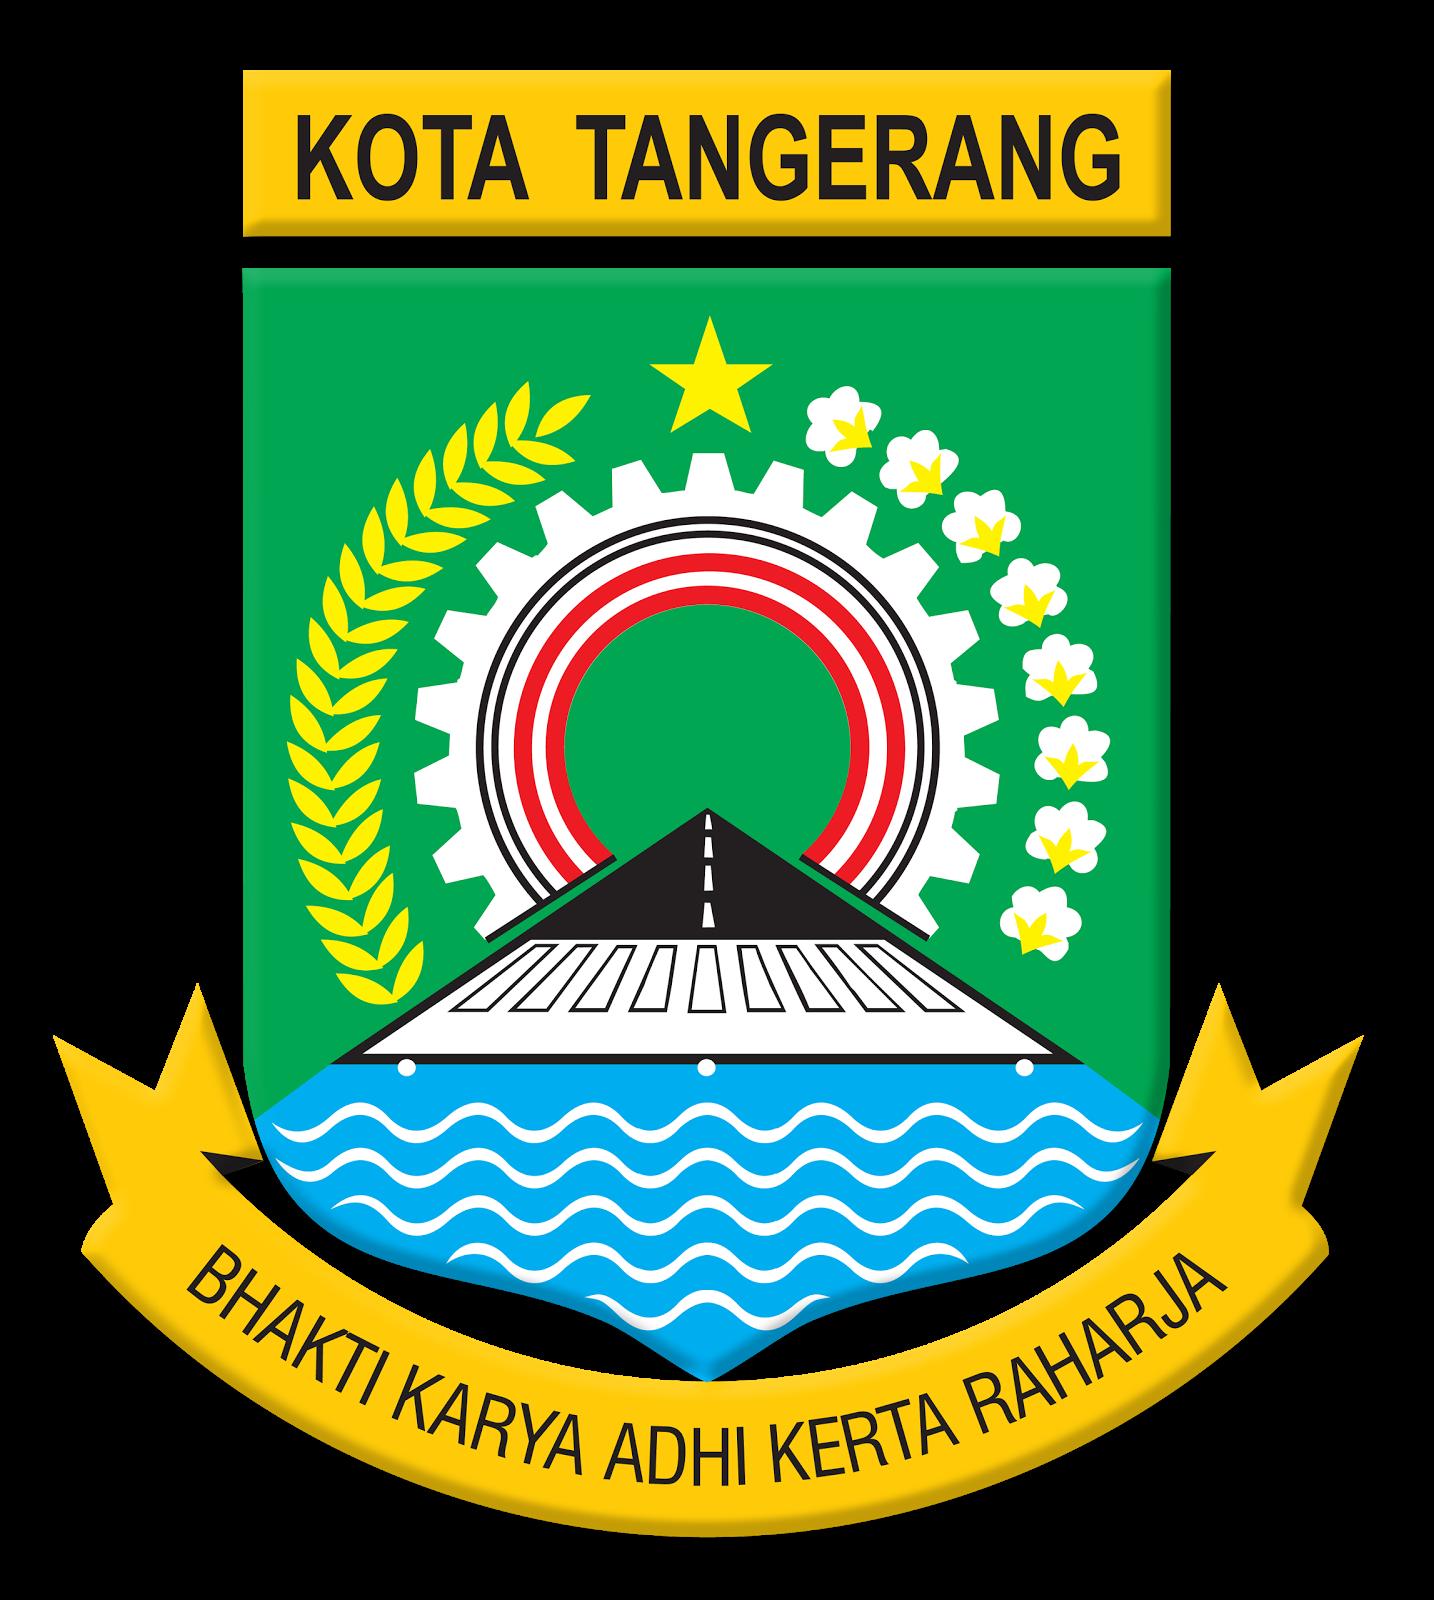 Jobsdb Indonesia Tangerang 2013 Terbaru Find Job Vacancies In Indonesia Jobsdb Indonesia Home 187; Loker 187; Lowongan Xxi Tangerang